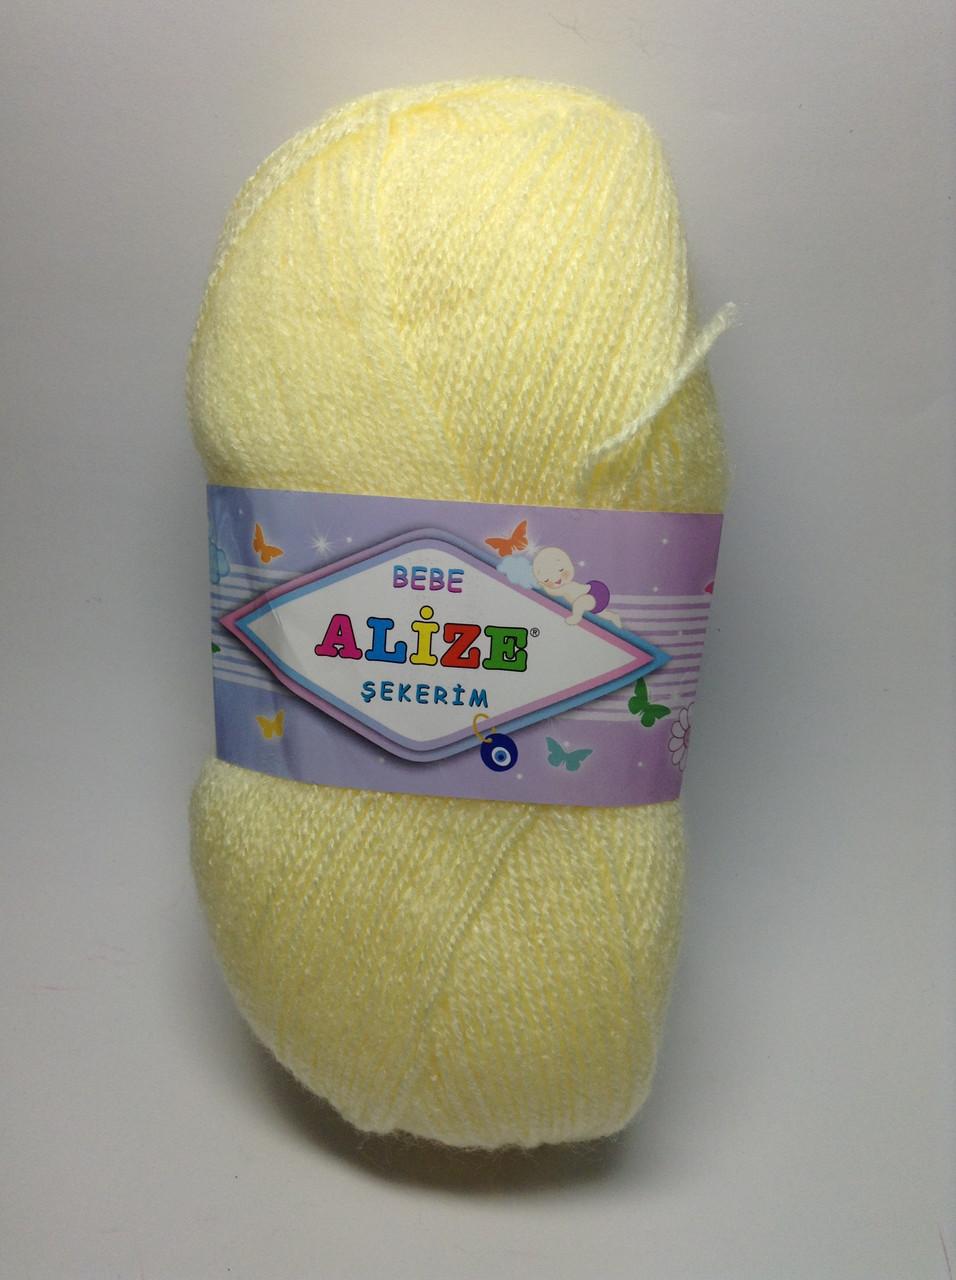 Пряжа sekerim bebe Alize